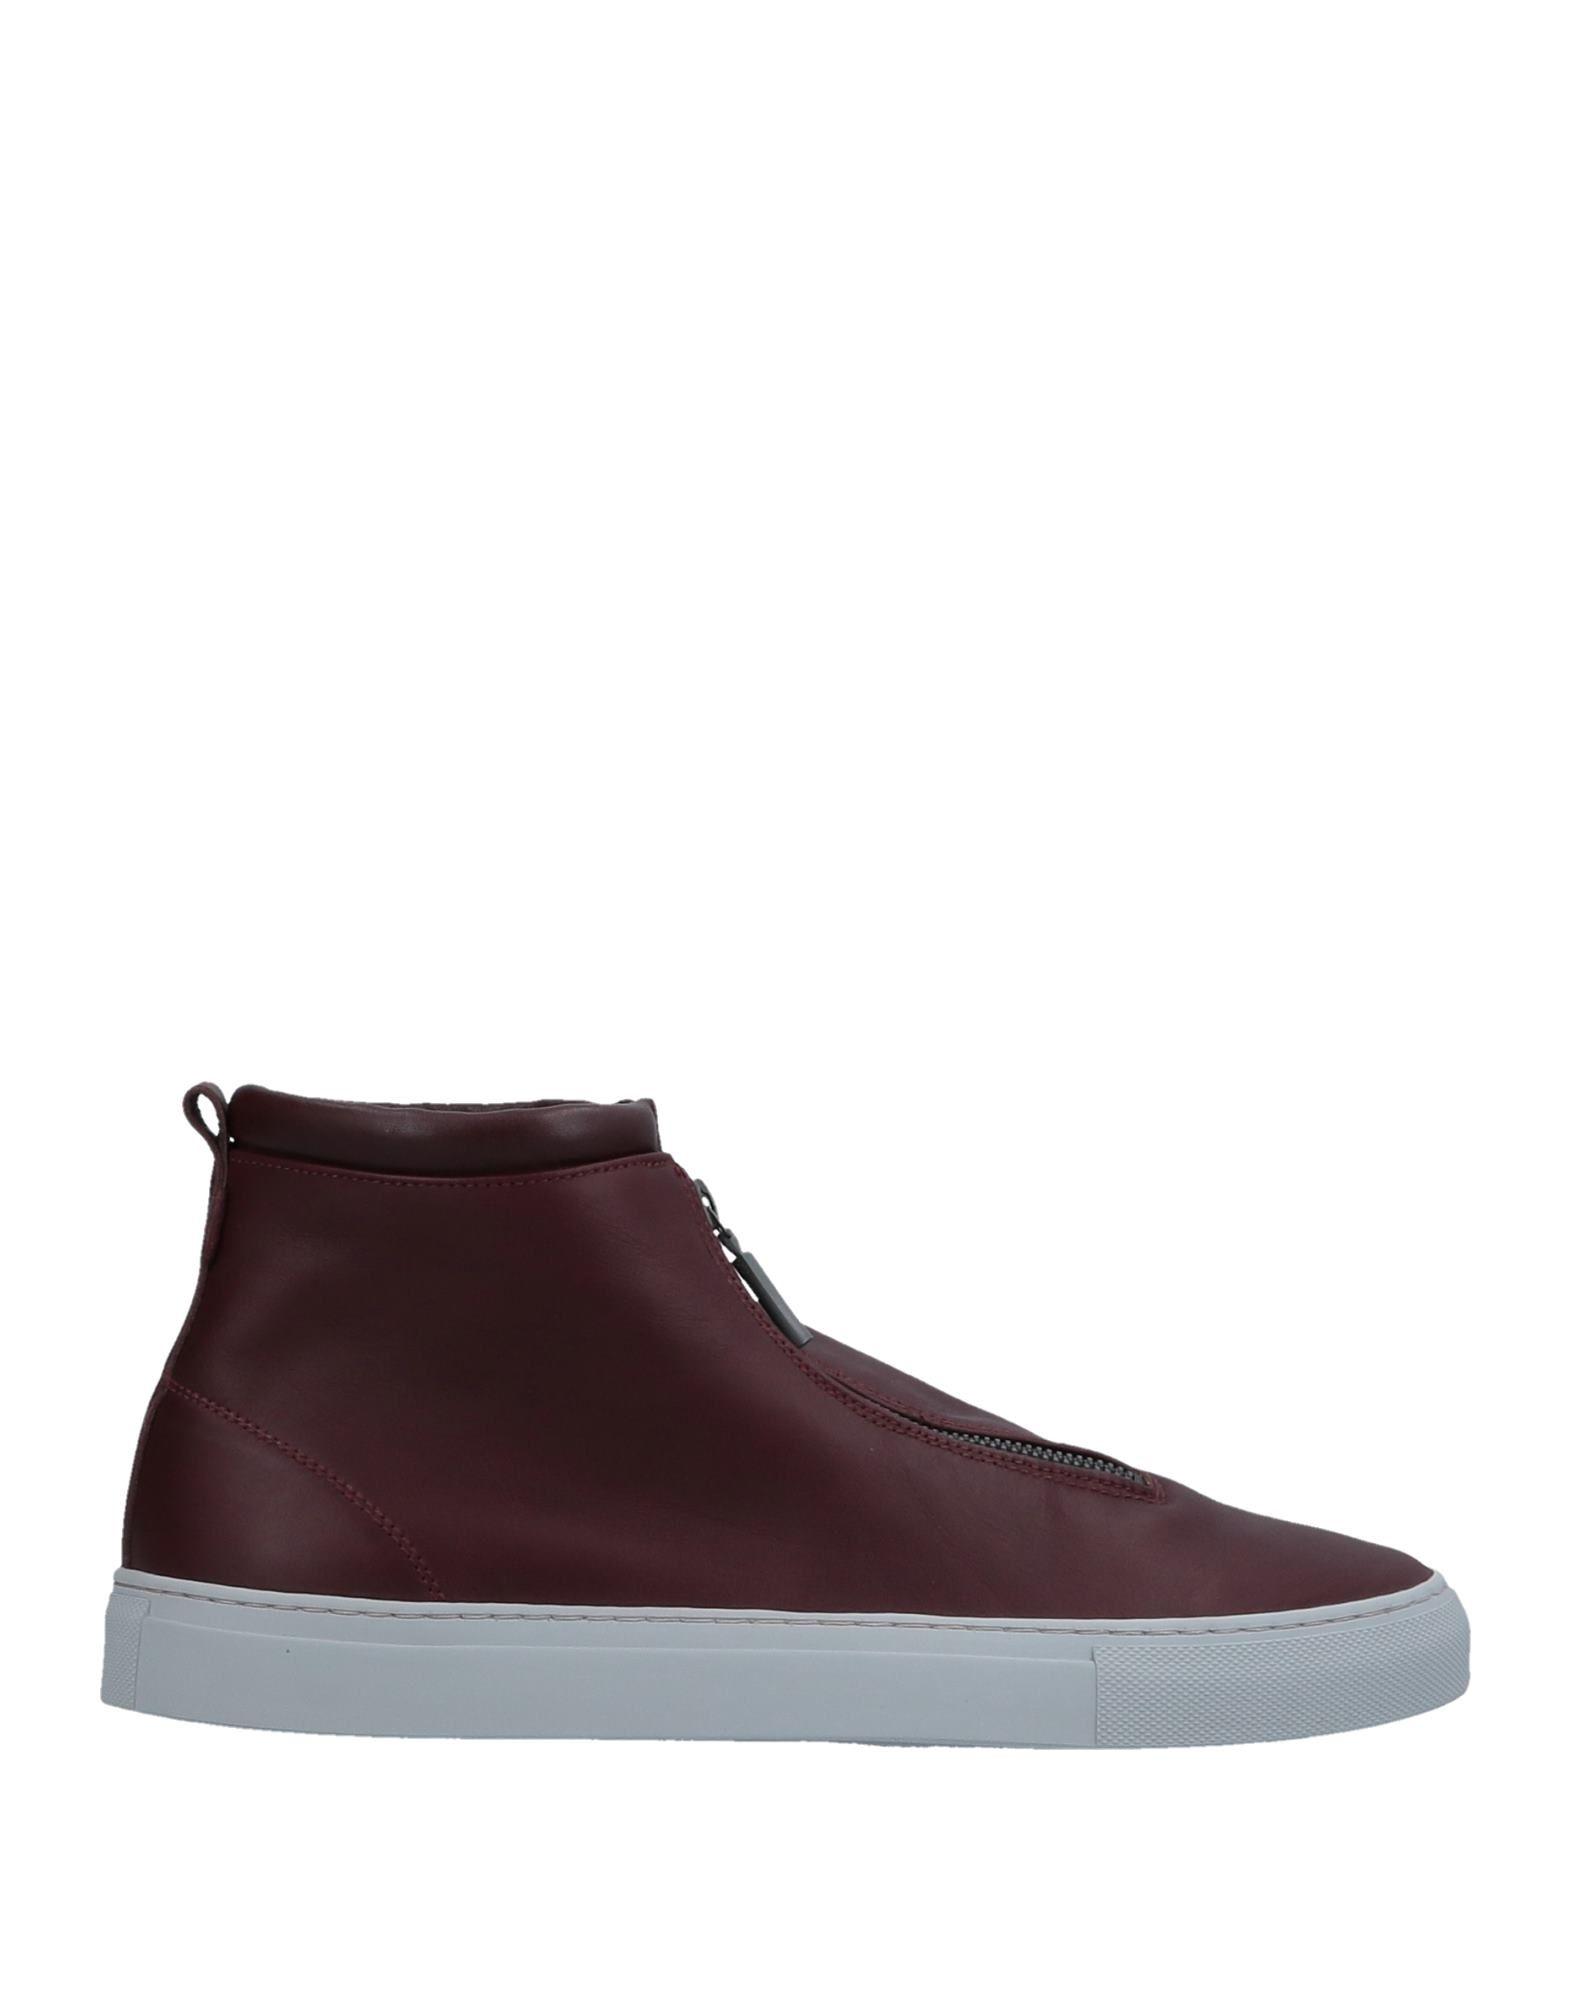 Diemme Sneakers Gute Herren  11500511XV Gute Sneakers Qualität beliebte Schuhe 22d8fc